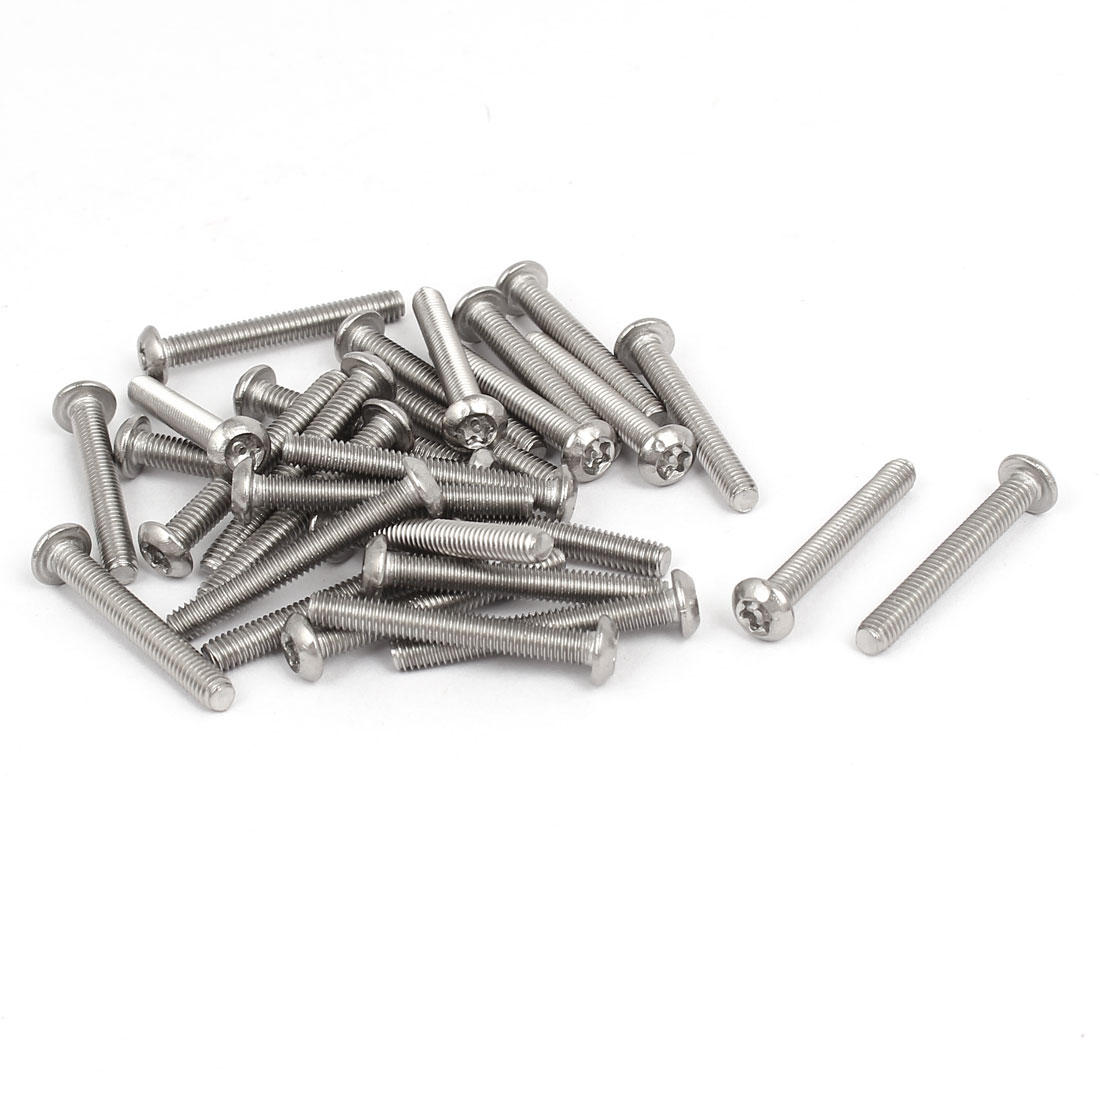 M4x30mm 304 Stainless Steel Button Head Torx Tamper Resistant Screws 30pcs